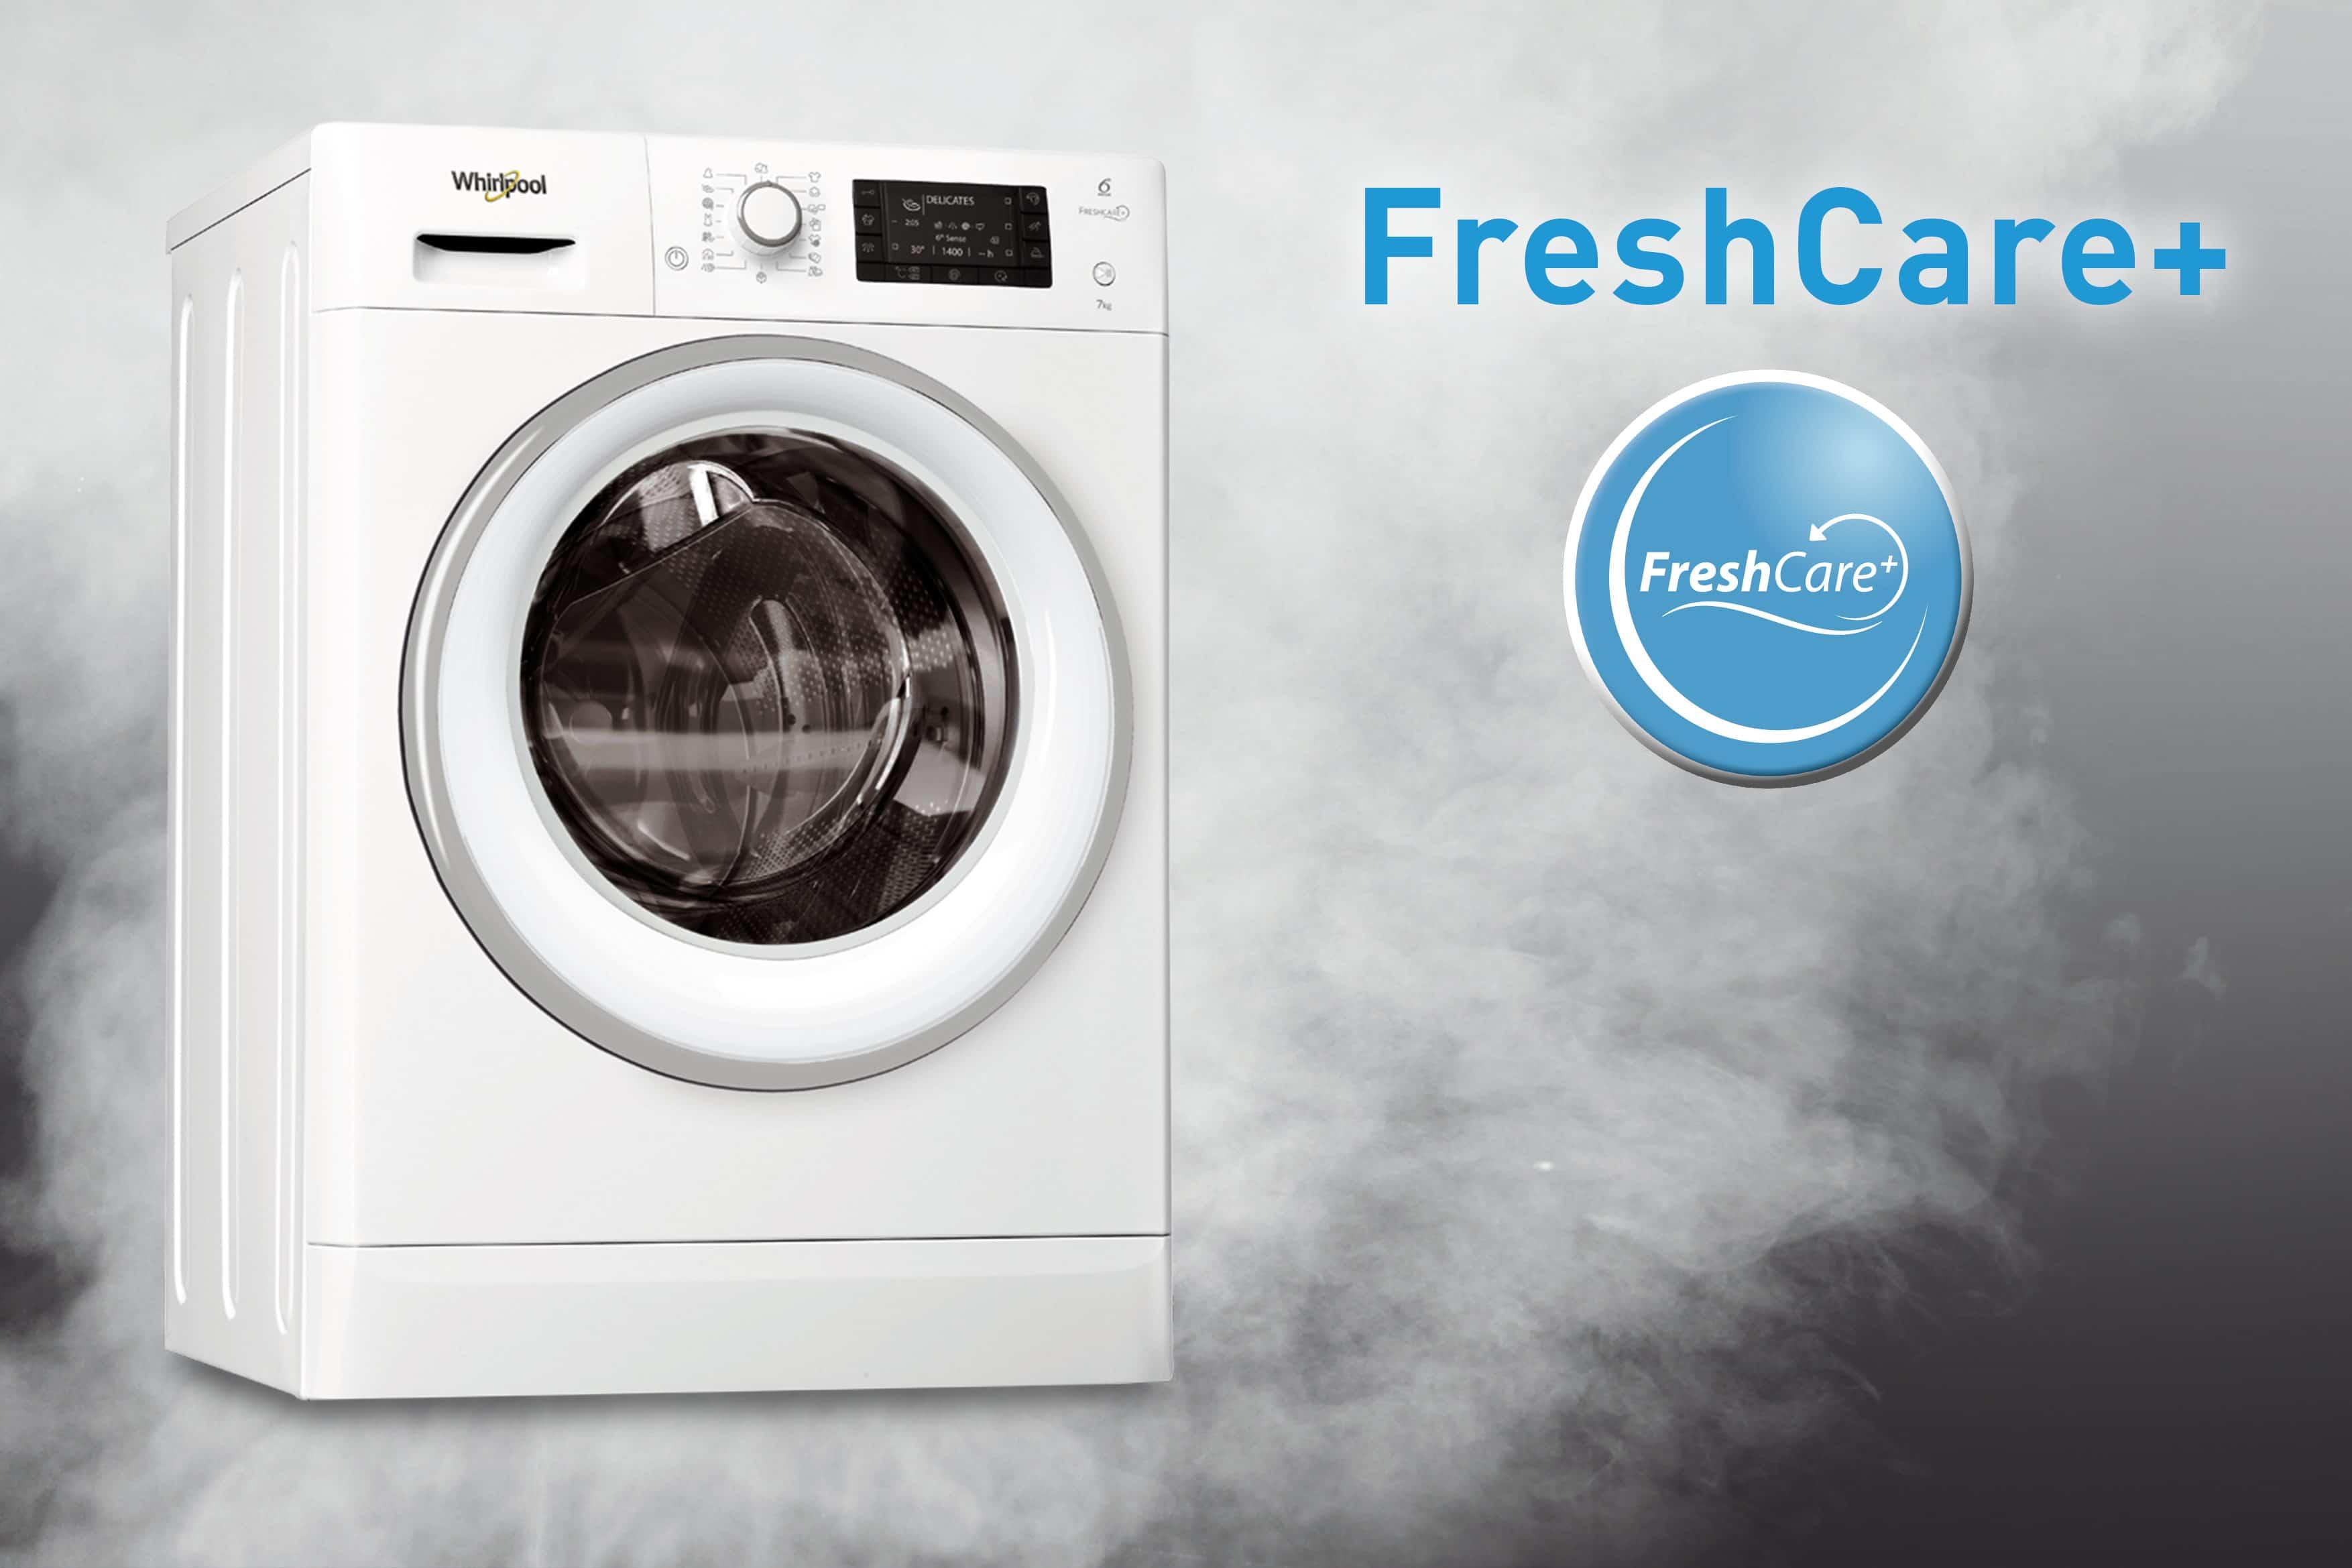 СМА Вирпул стехнологией FreshCare+